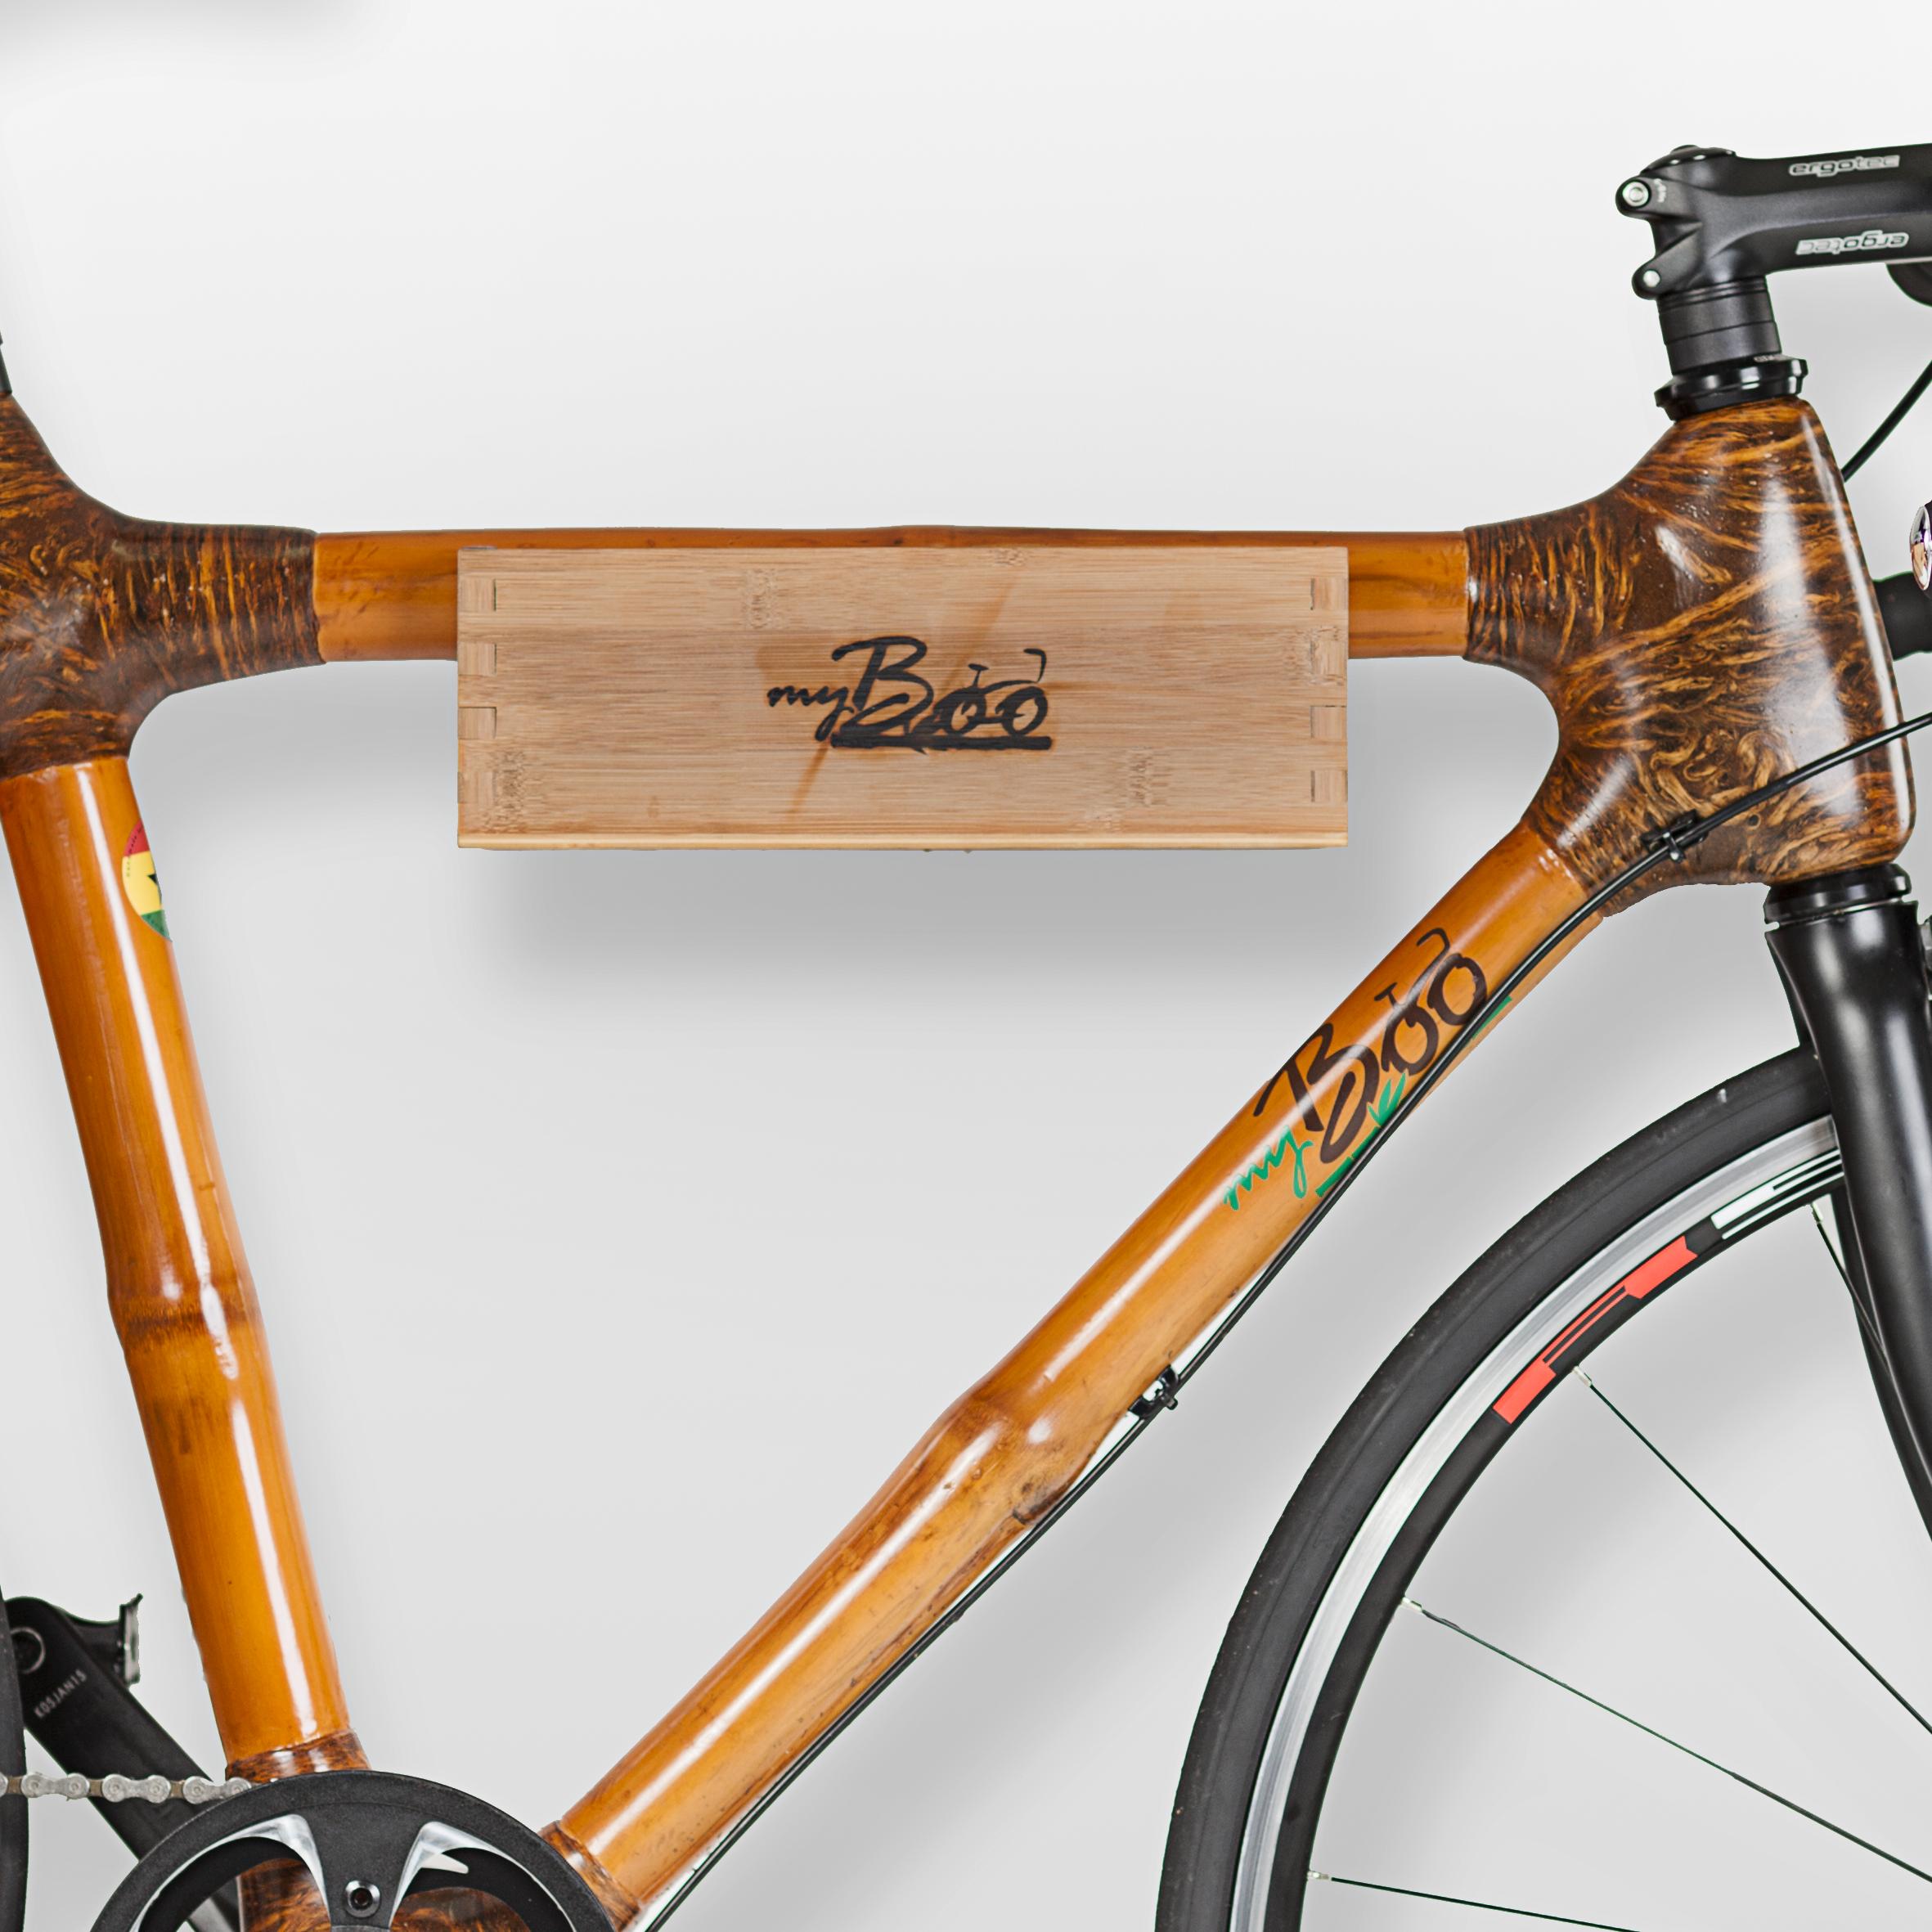 fahrrad in wohnung verboten wohn design. Black Bedroom Furniture Sets. Home Design Ideas